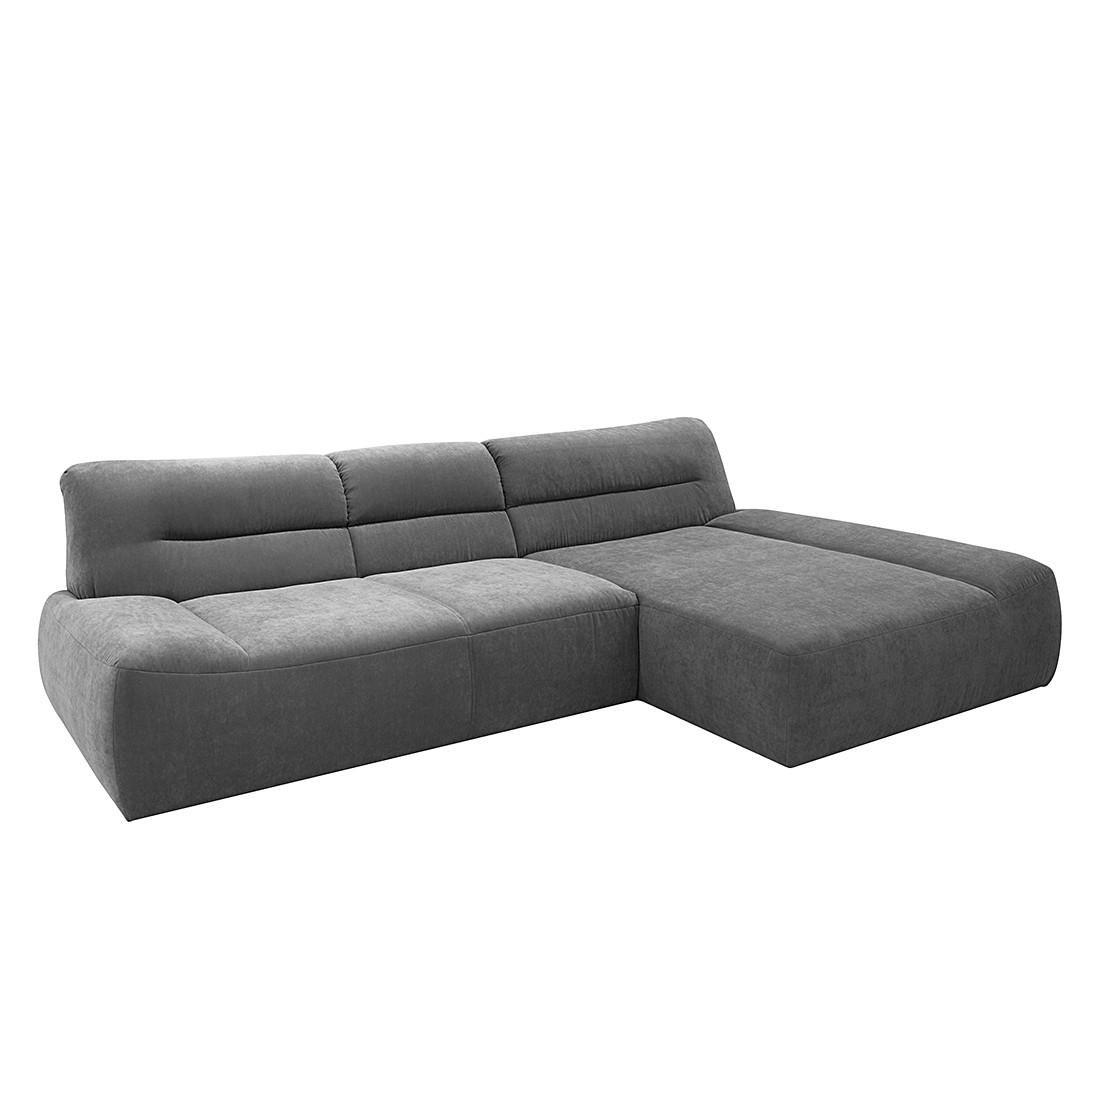 ecksofa oklahoma webstoff hellgrau longchair. Black Bedroom Furniture Sets. Home Design Ideas